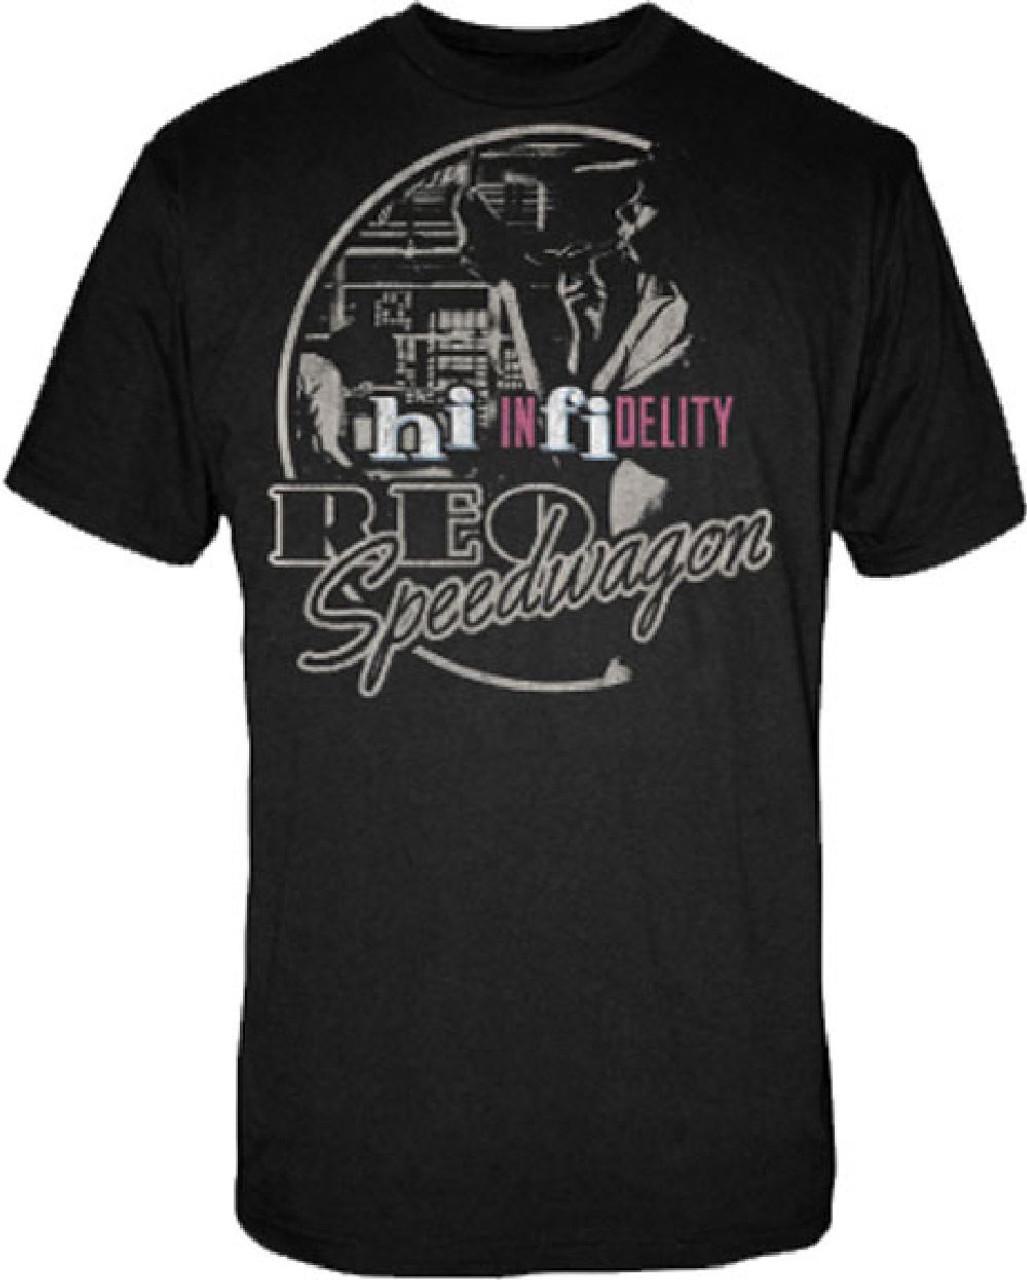 REO Speedwagon T-shirt - Hi Infidelity Album Cover Artwork  Men's Black  Vintage Shirt